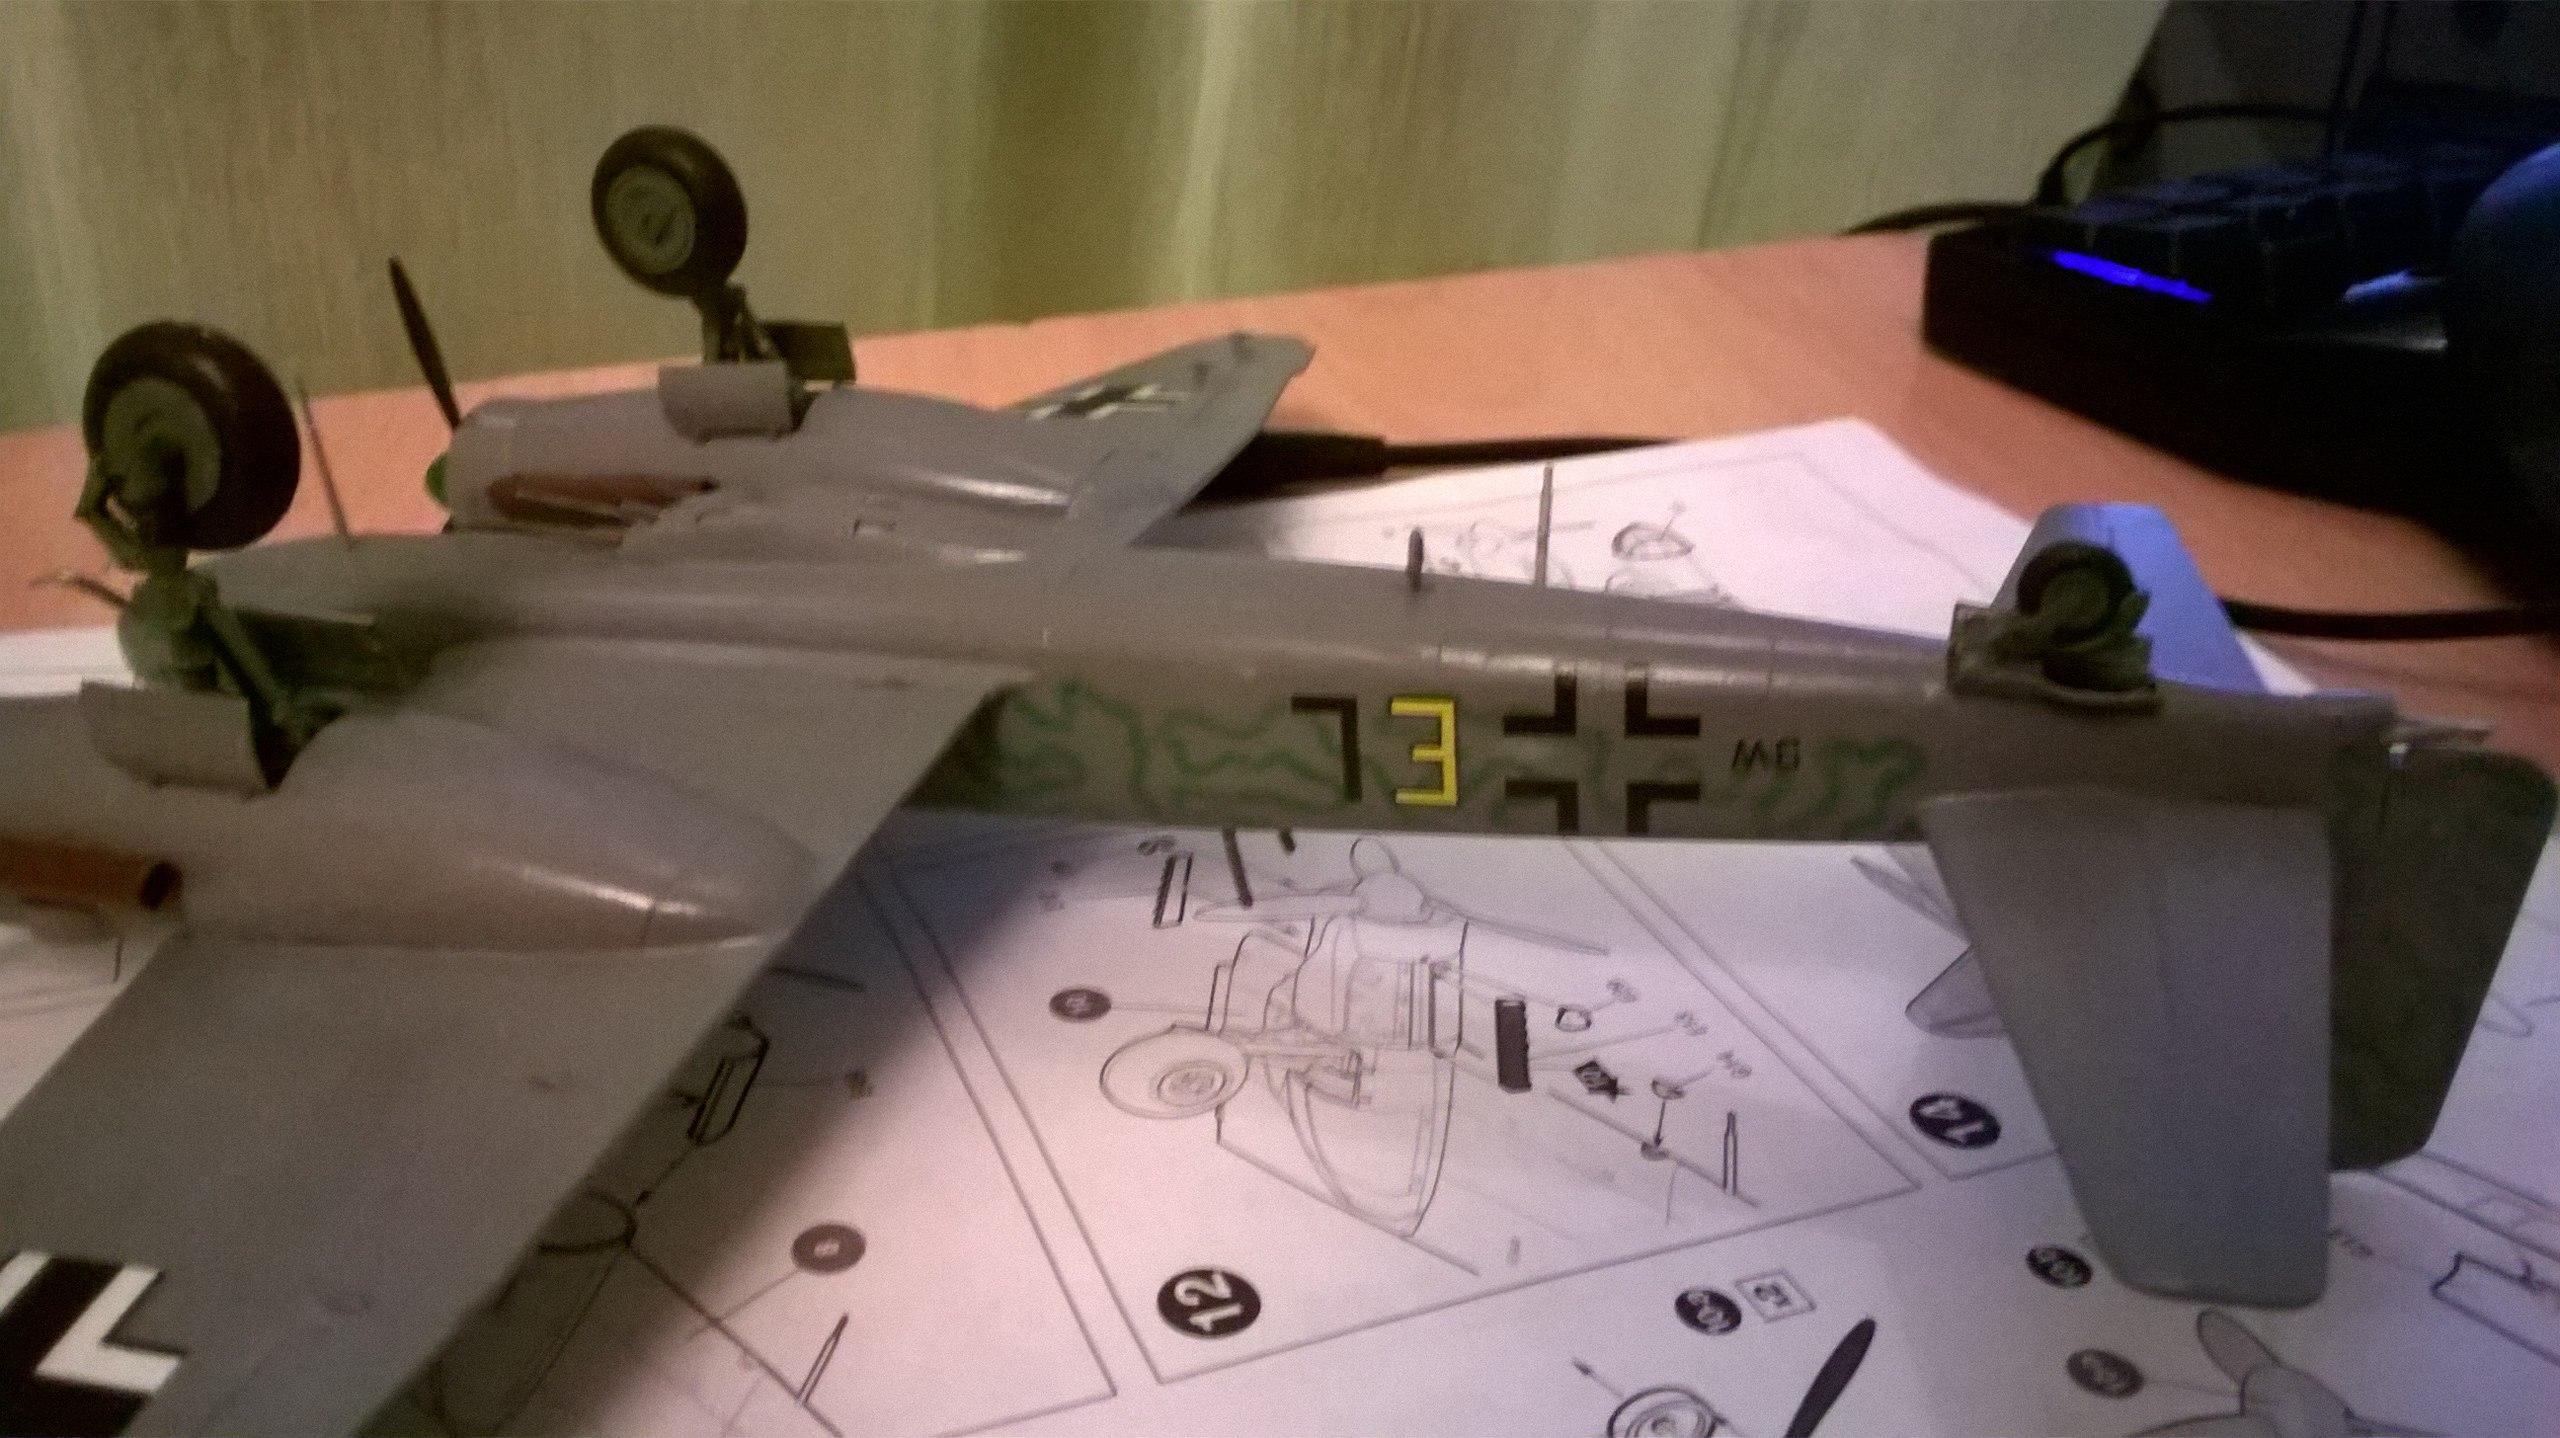 Ju-88 G-6 1/72 (Звезда) Fzvo2nqaZ1c